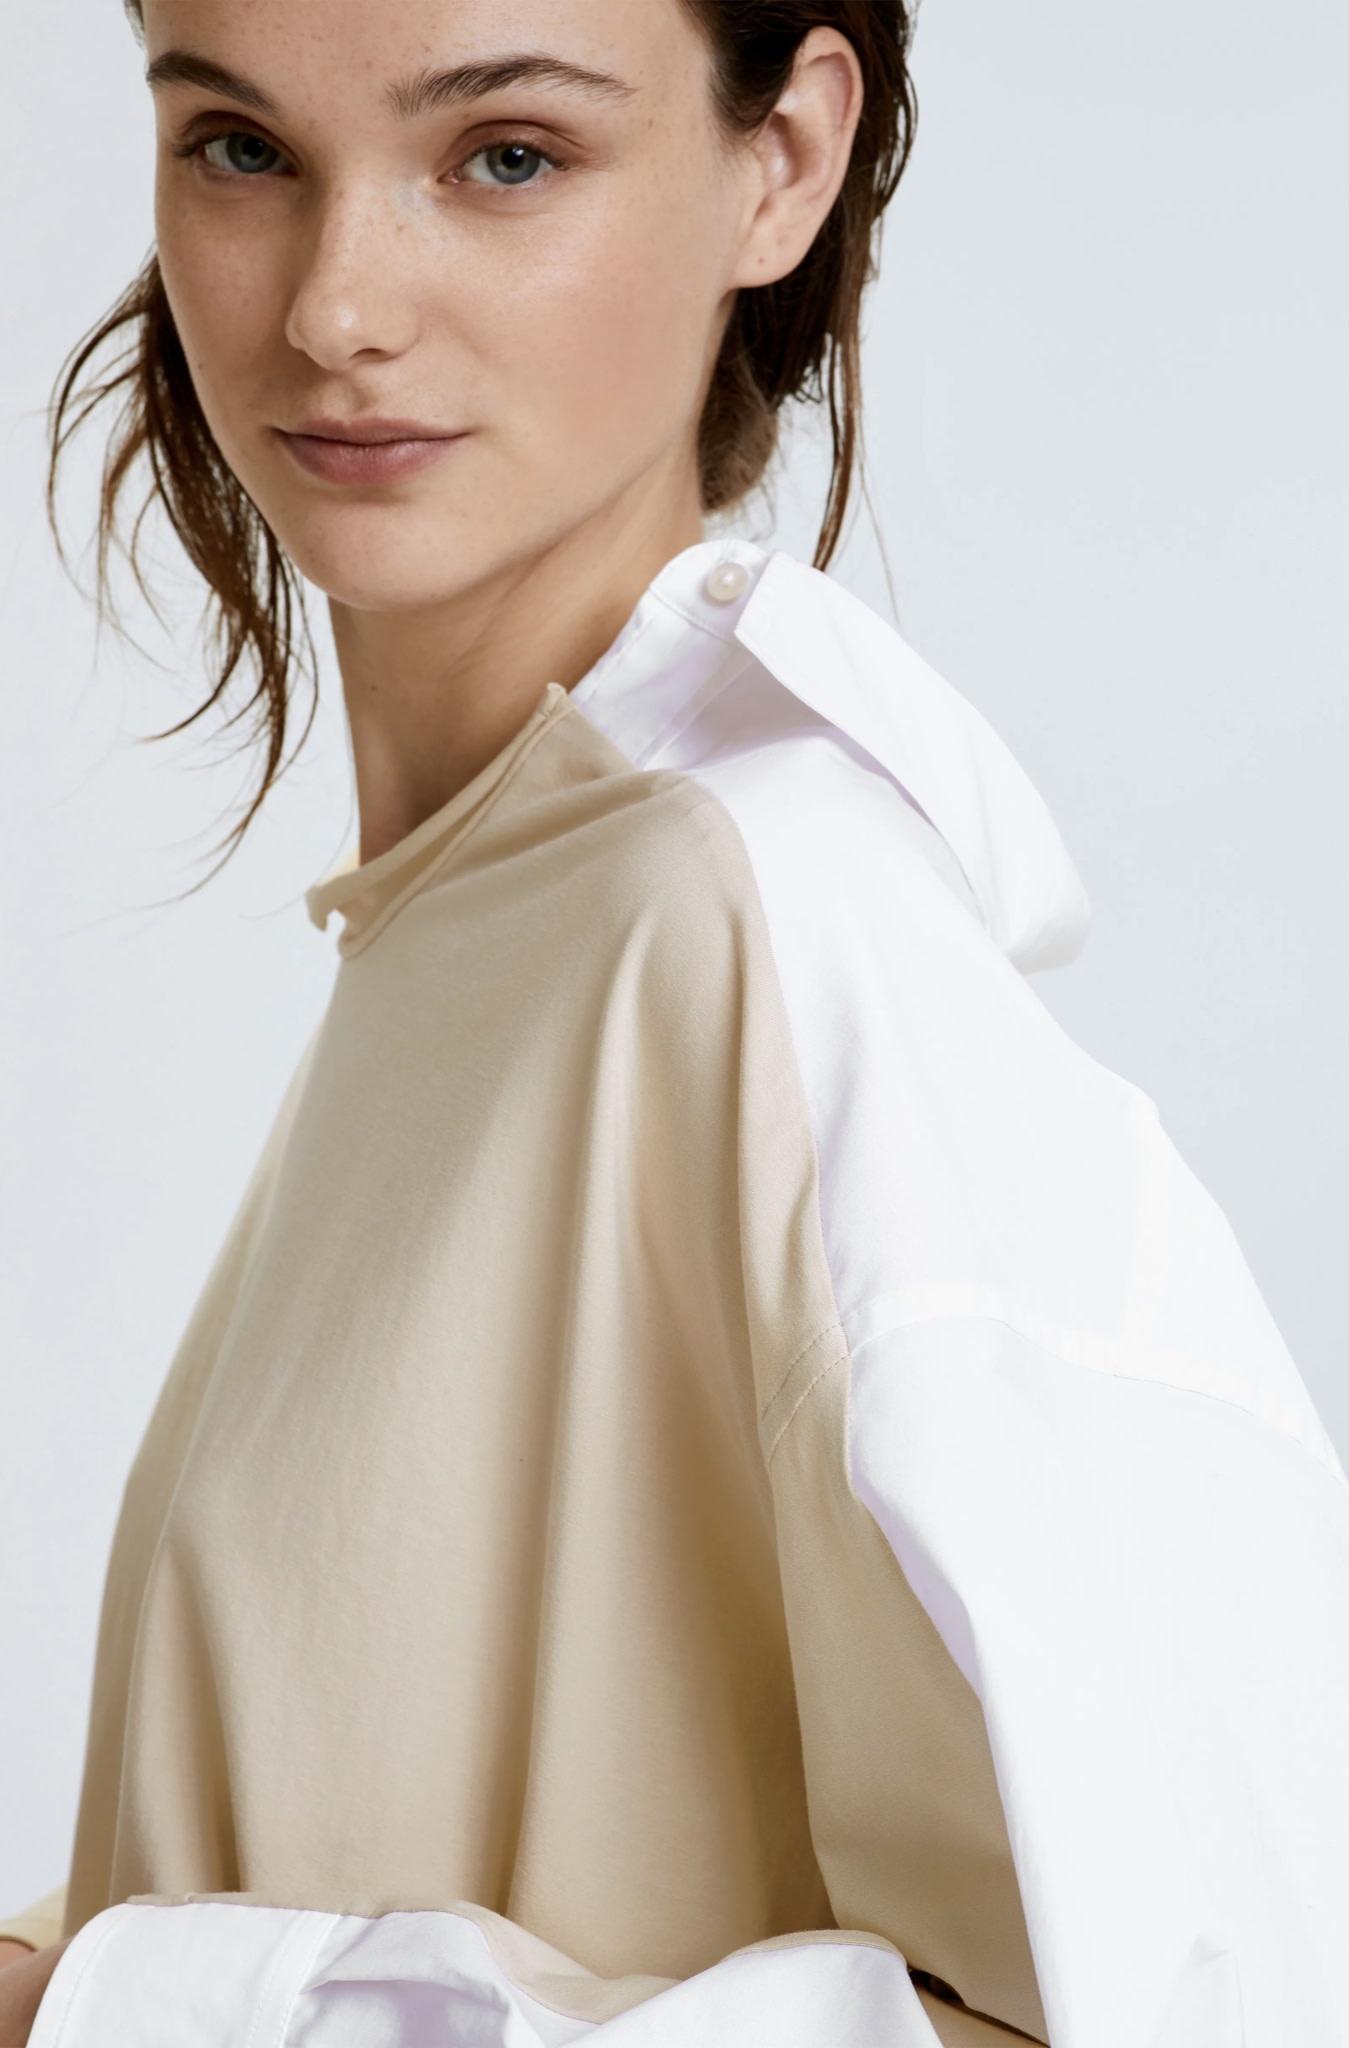 Cool contrast shirt dorothee schumacher-3